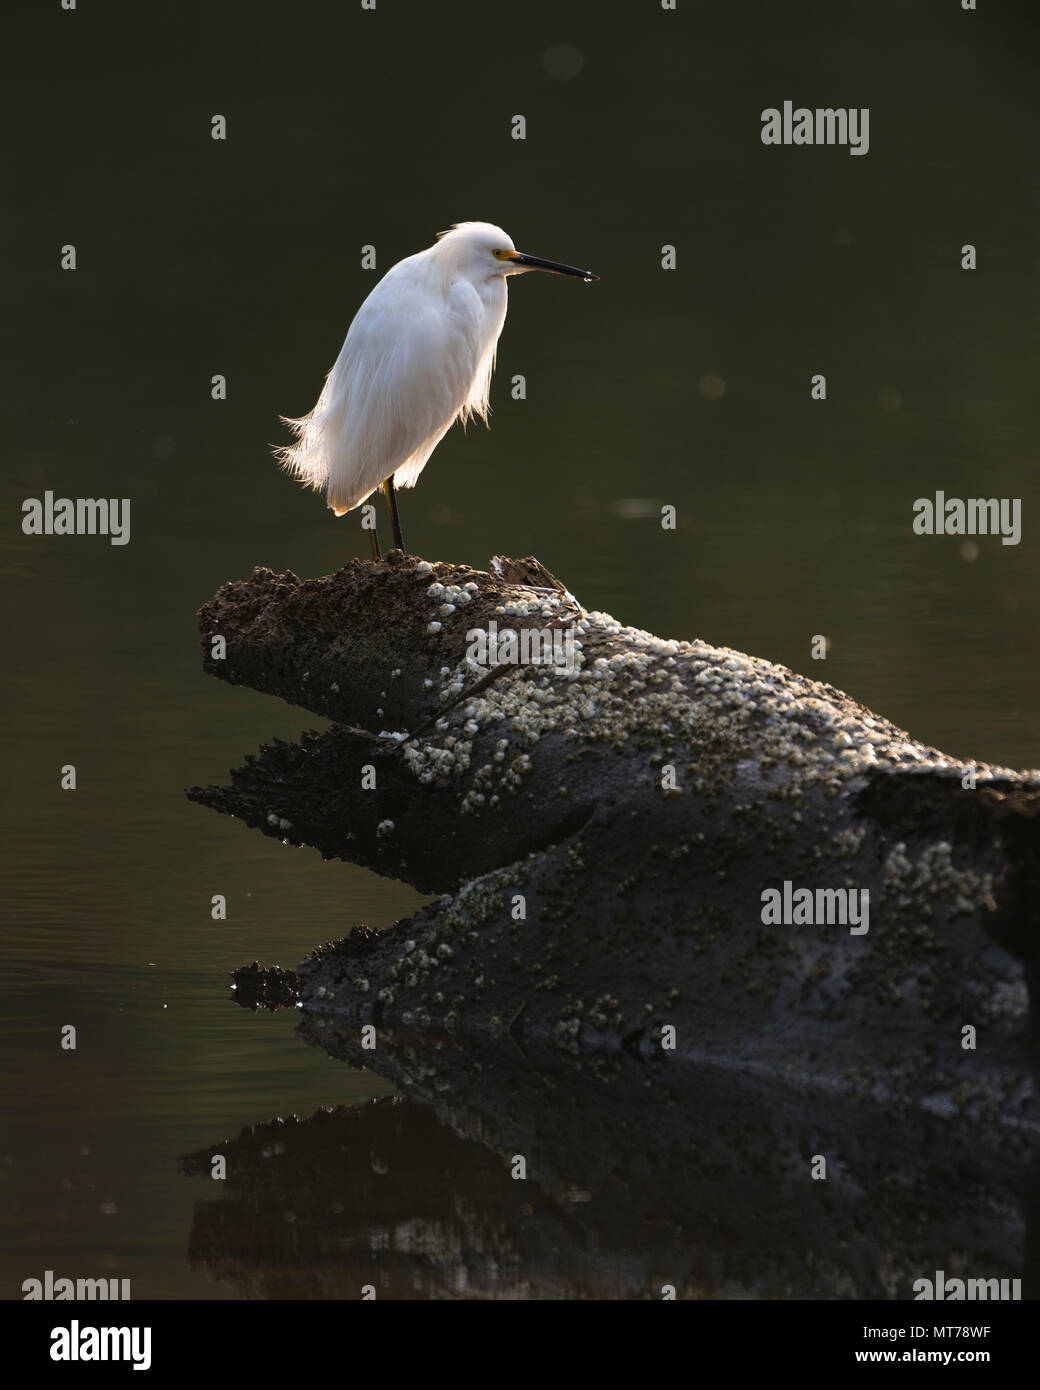 Snowy Egret (Egretta thula) from SE Brazil - Stock Image